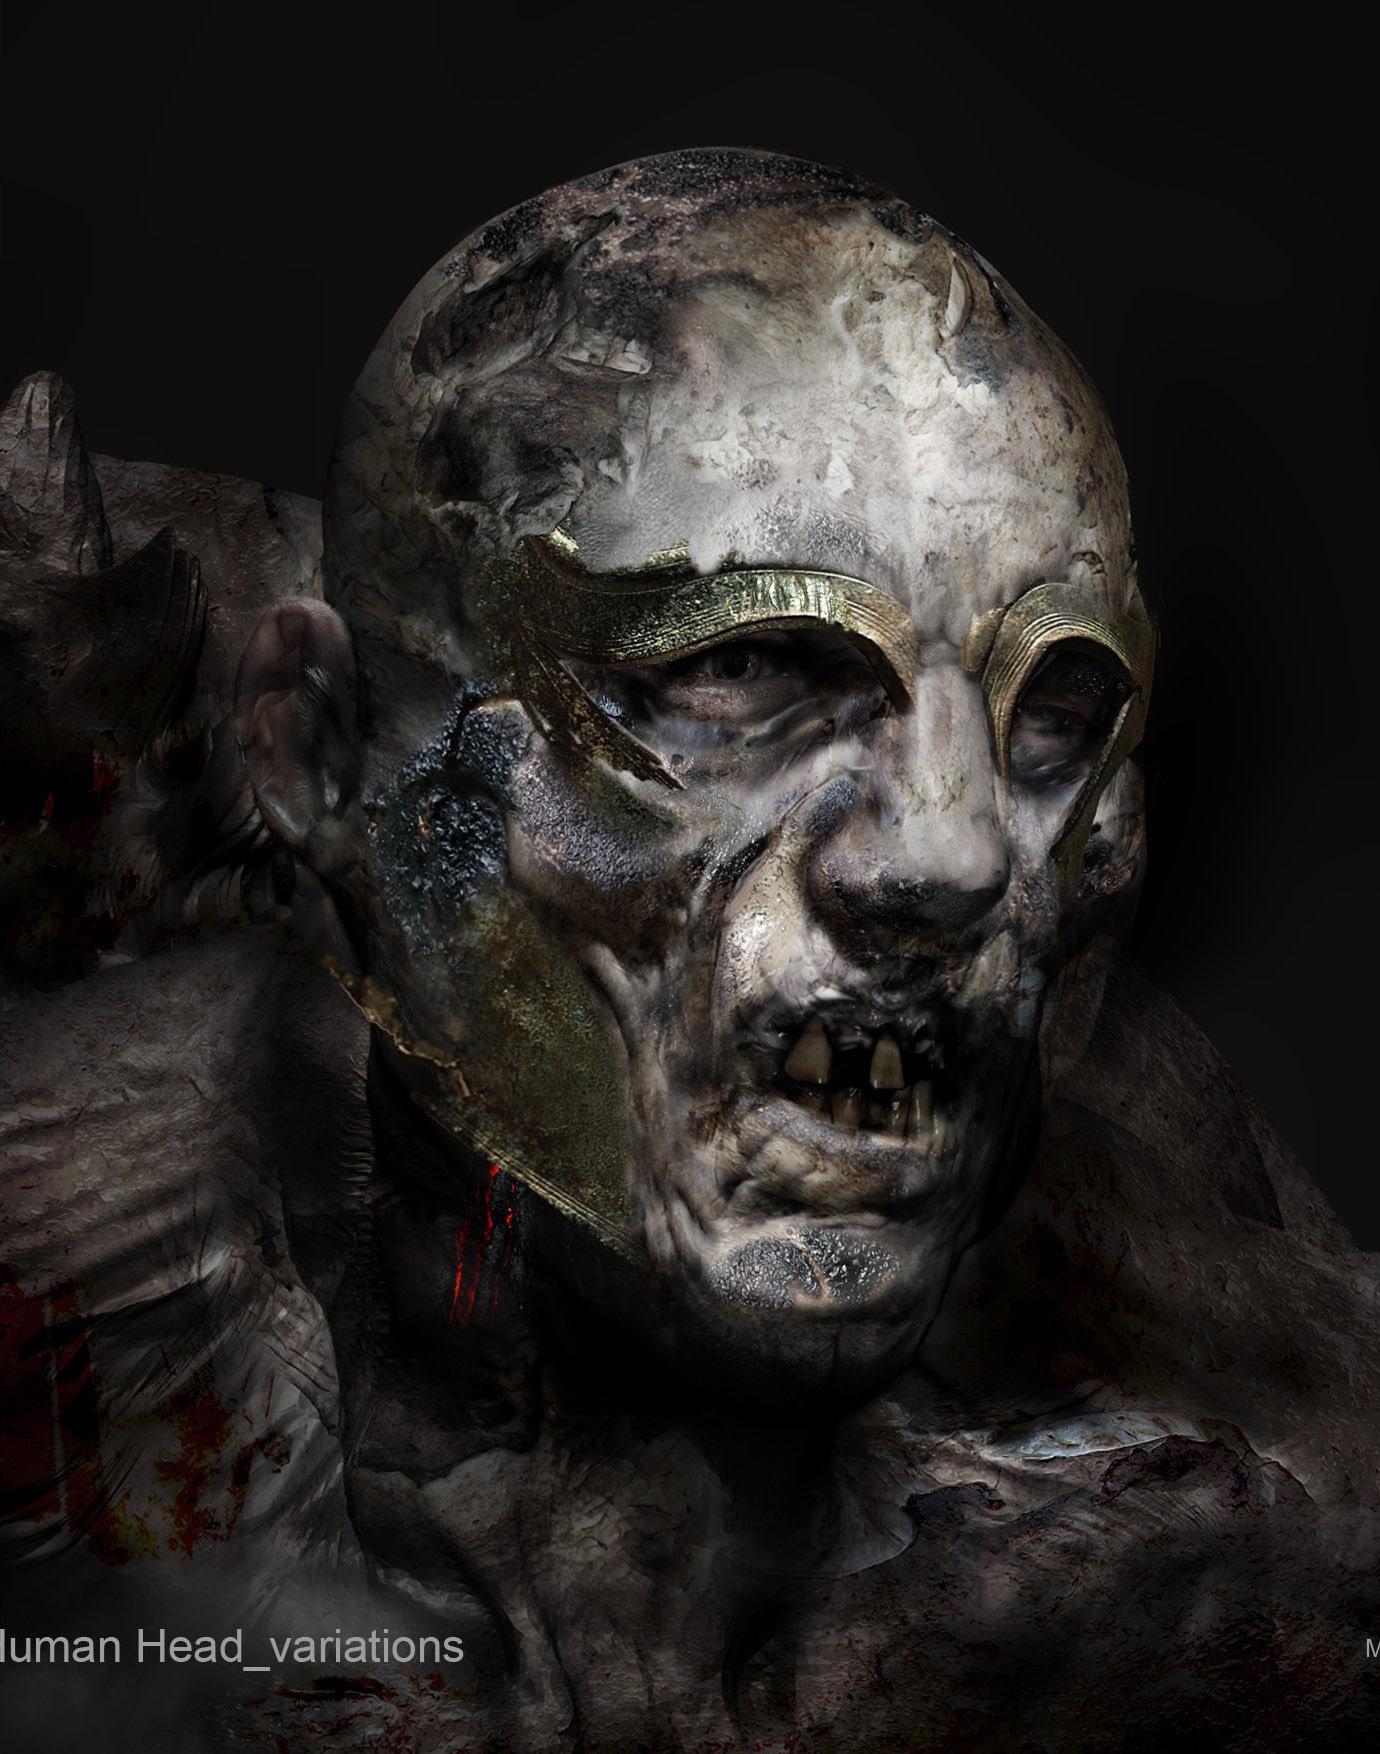 Andrei riabovitchev ma l humanheadvariations01